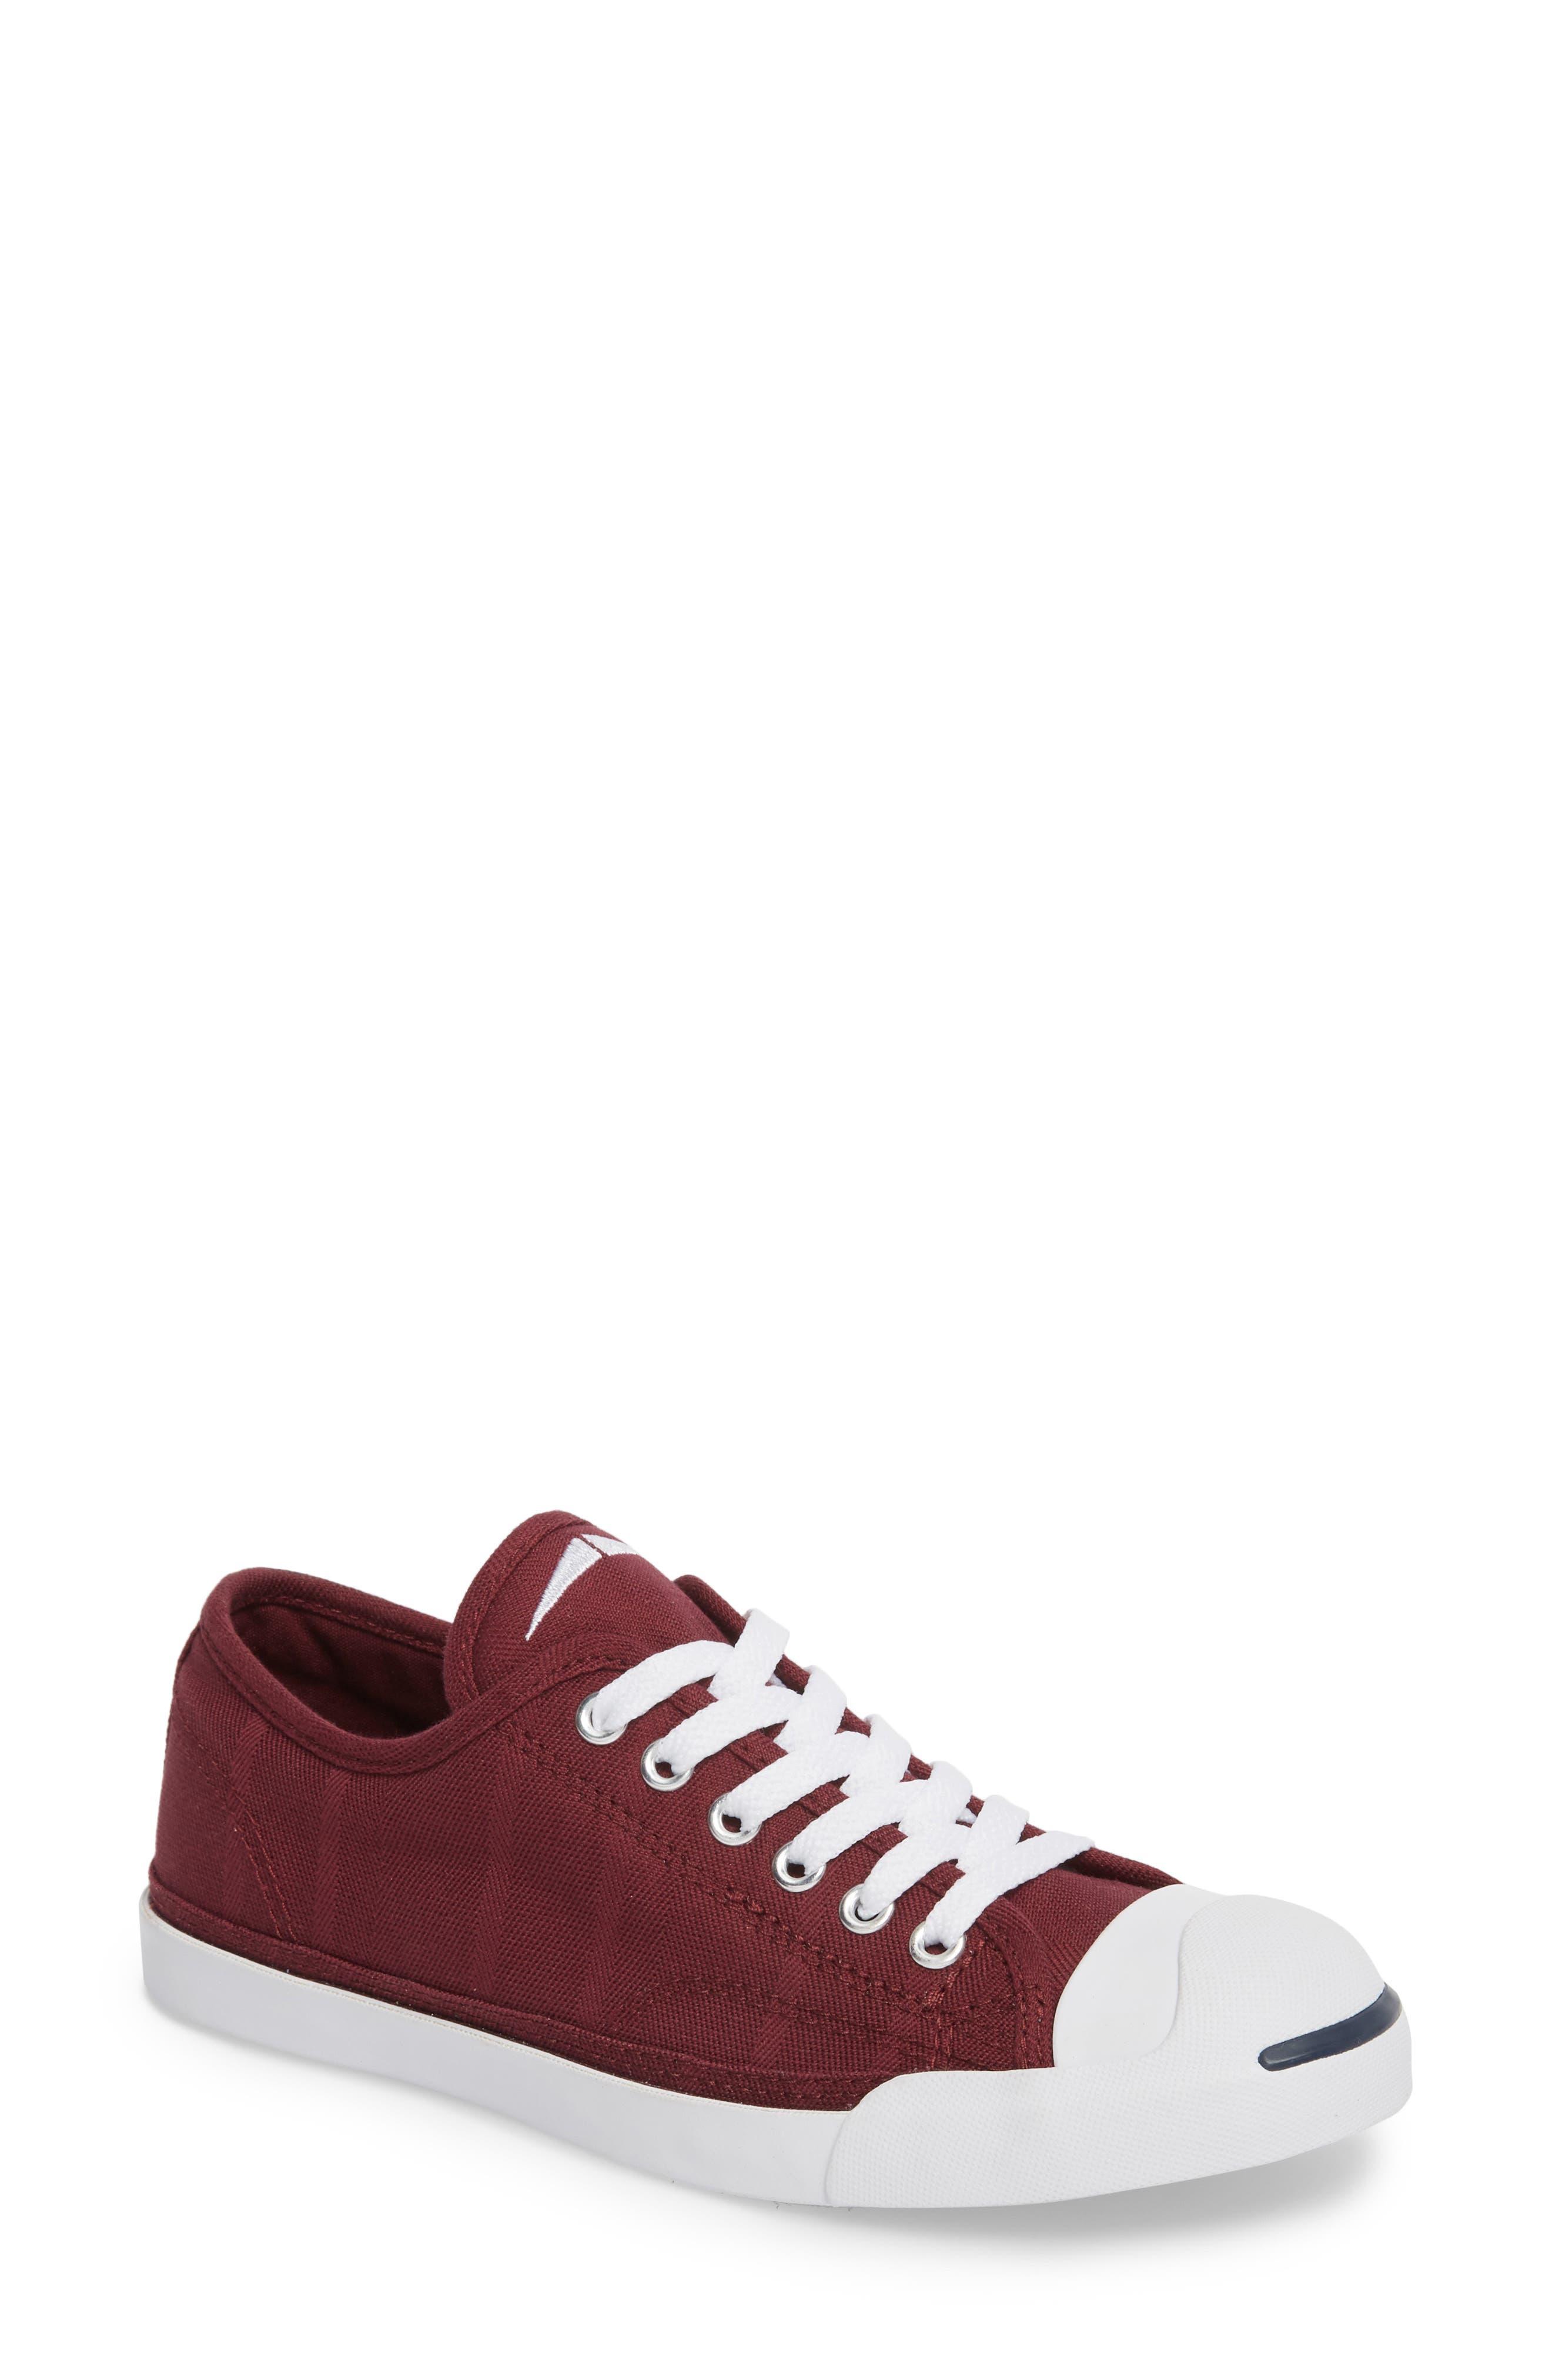 Jack Purcell Low Top Sneaker, Main, color, DARK BURGUNDY